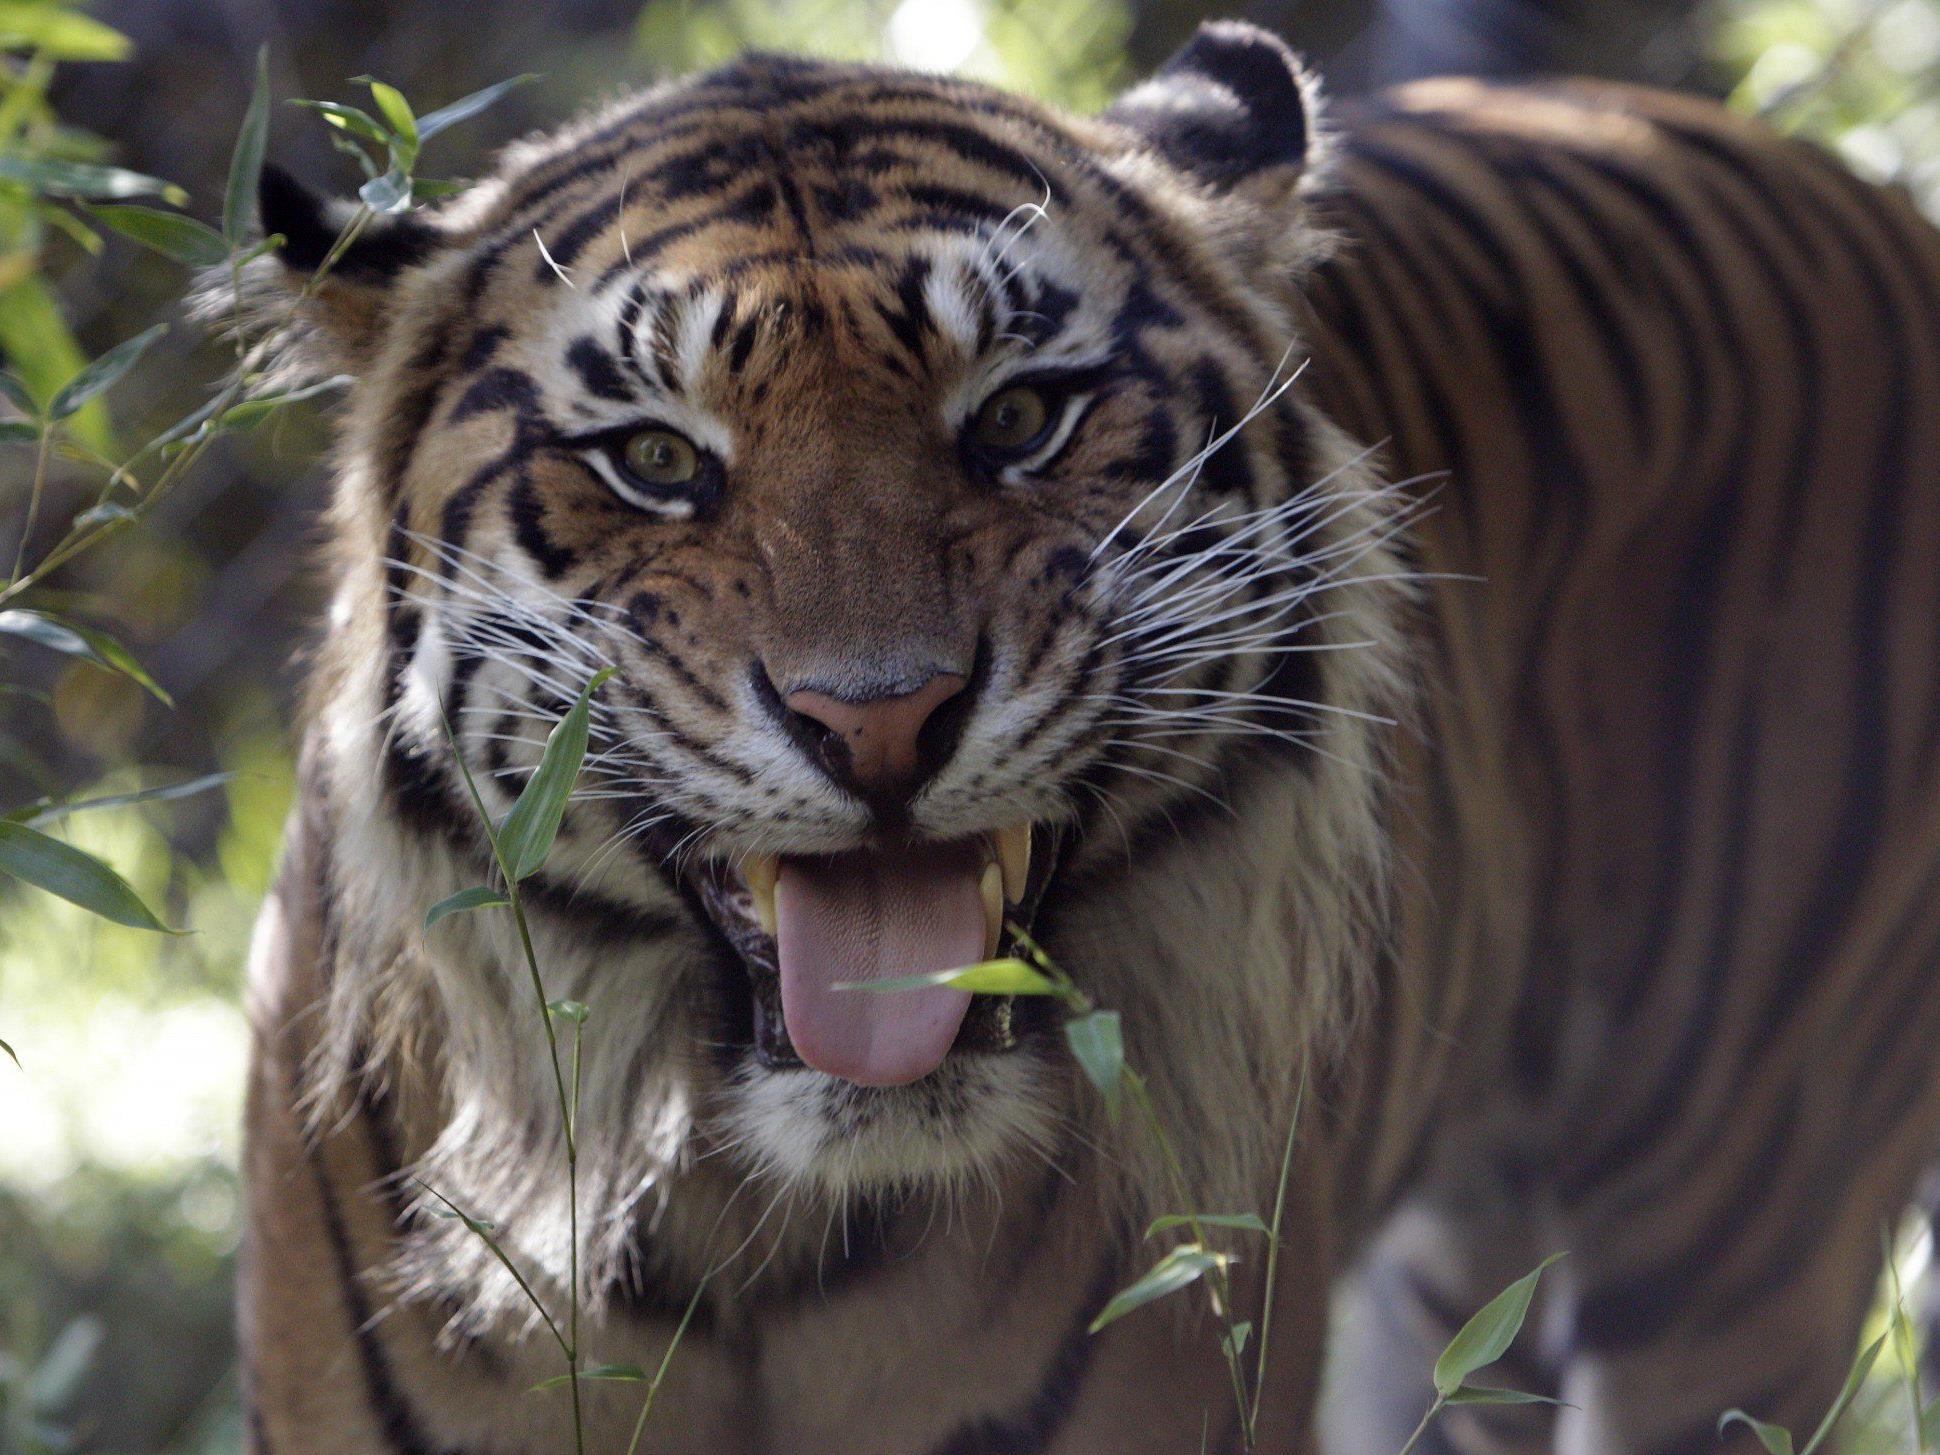 In Indien leben noch 1.700 Tiger.